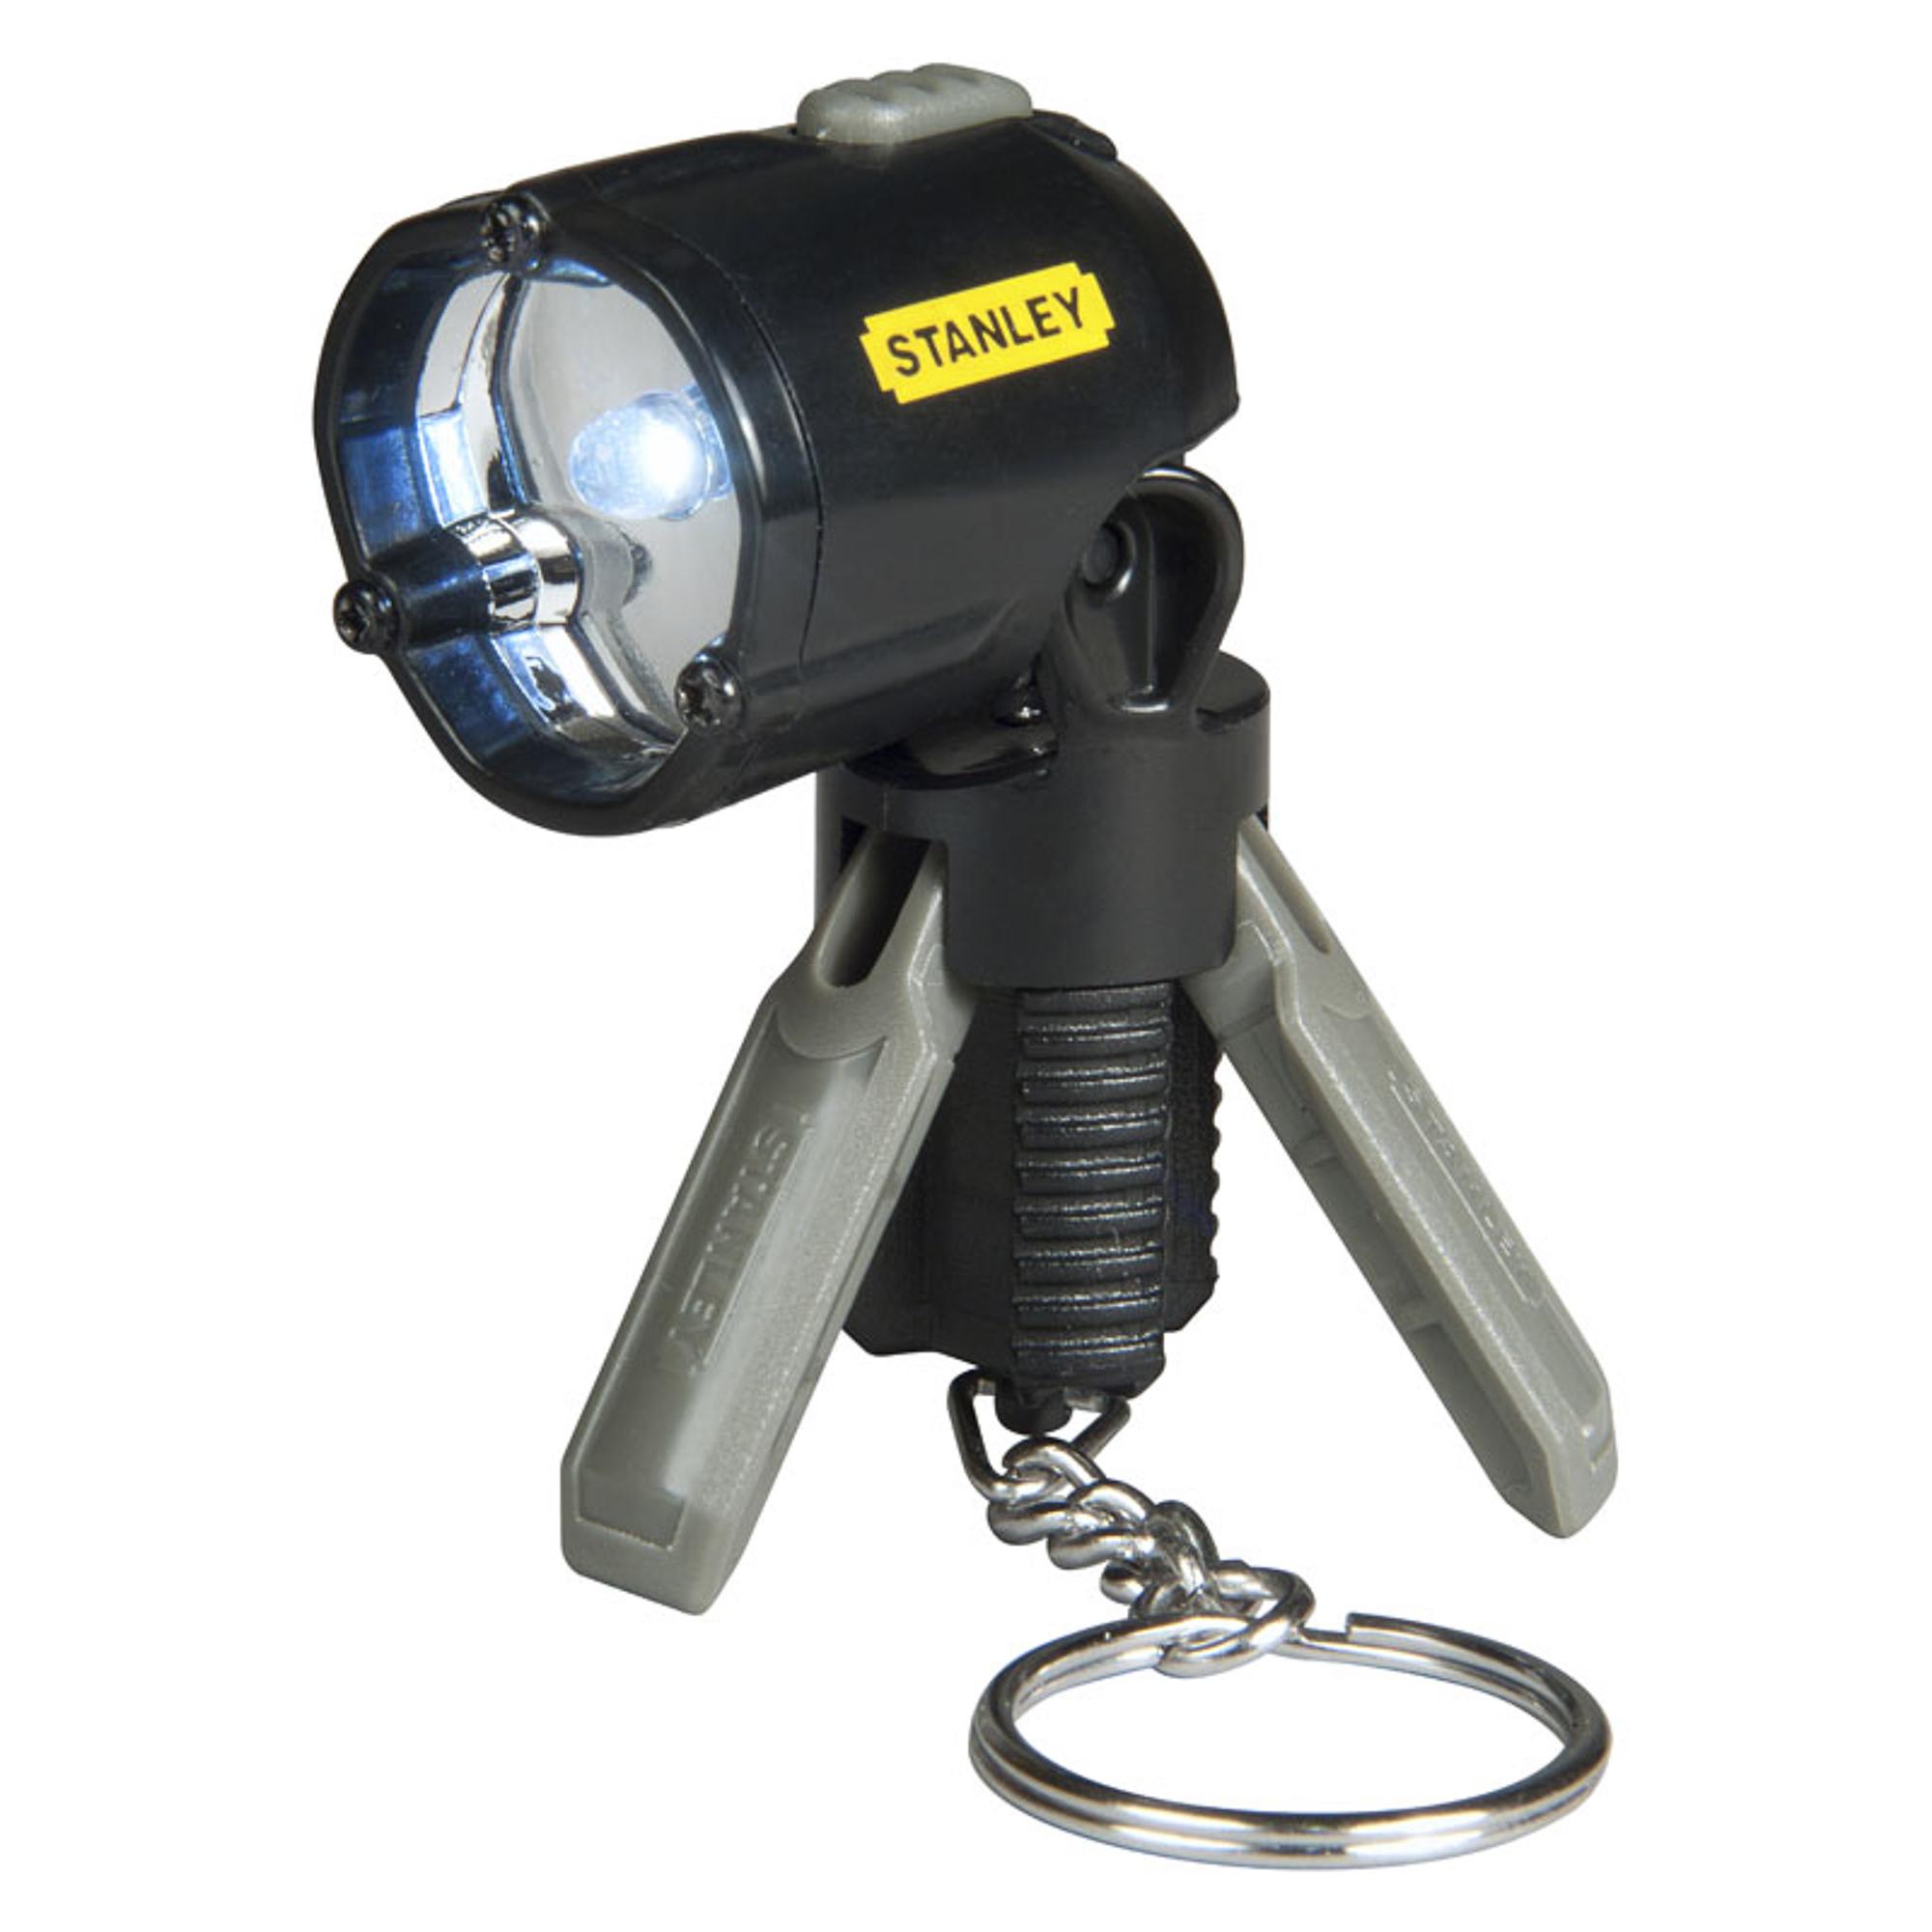 Фонарик-брелок светодиодный STANLEY MaxLife Mini Tripod с мини-треногой